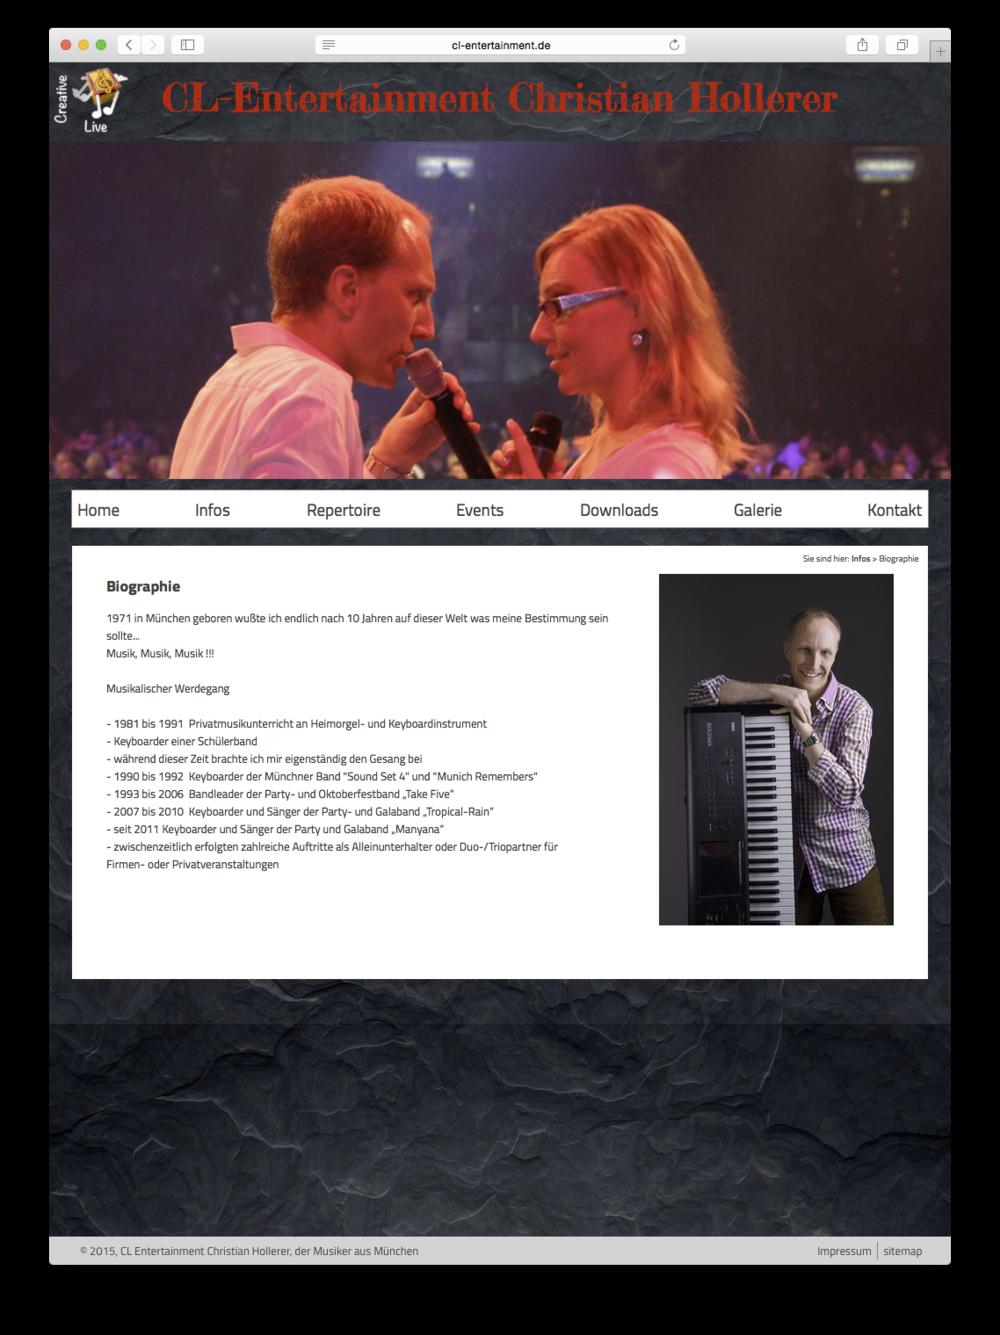 Screenshot 2015-05-07 03.52.42.png